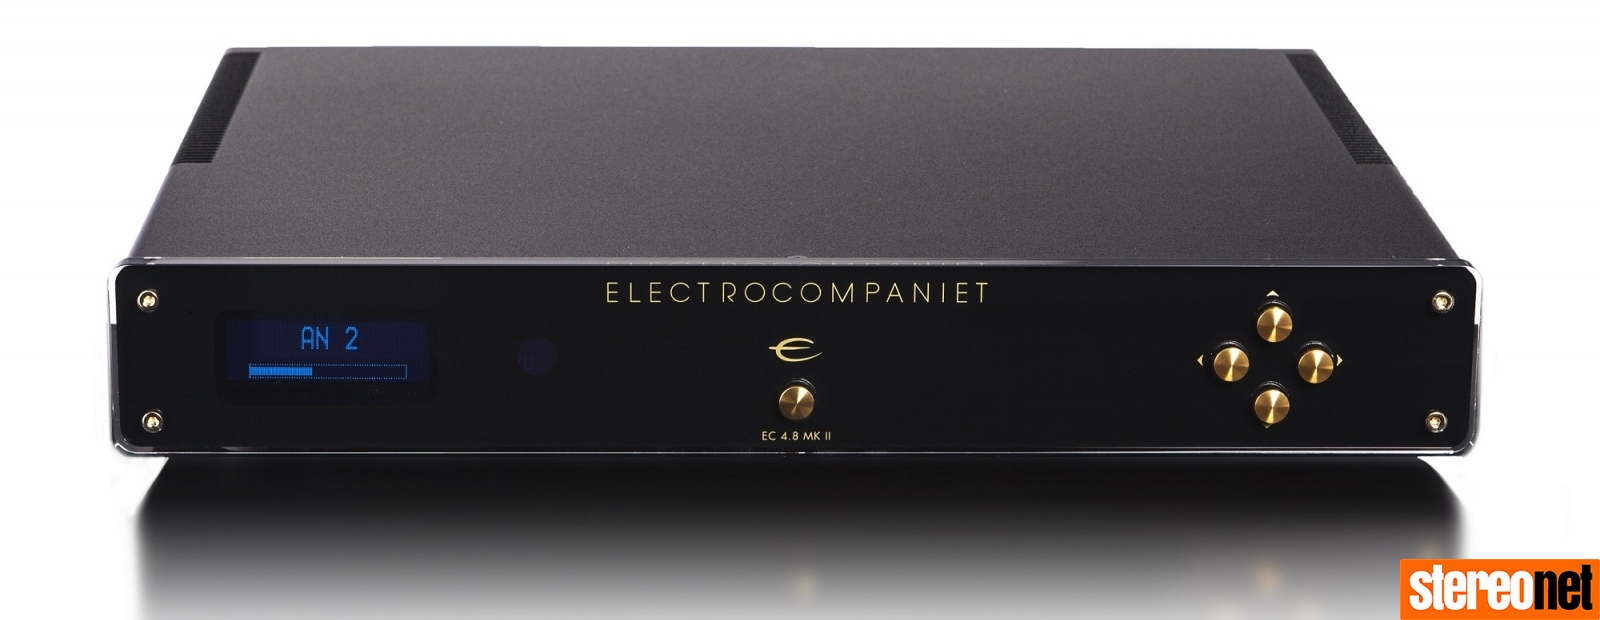 Electrocompaniet EC 4.8 MKII Pre-amplifier